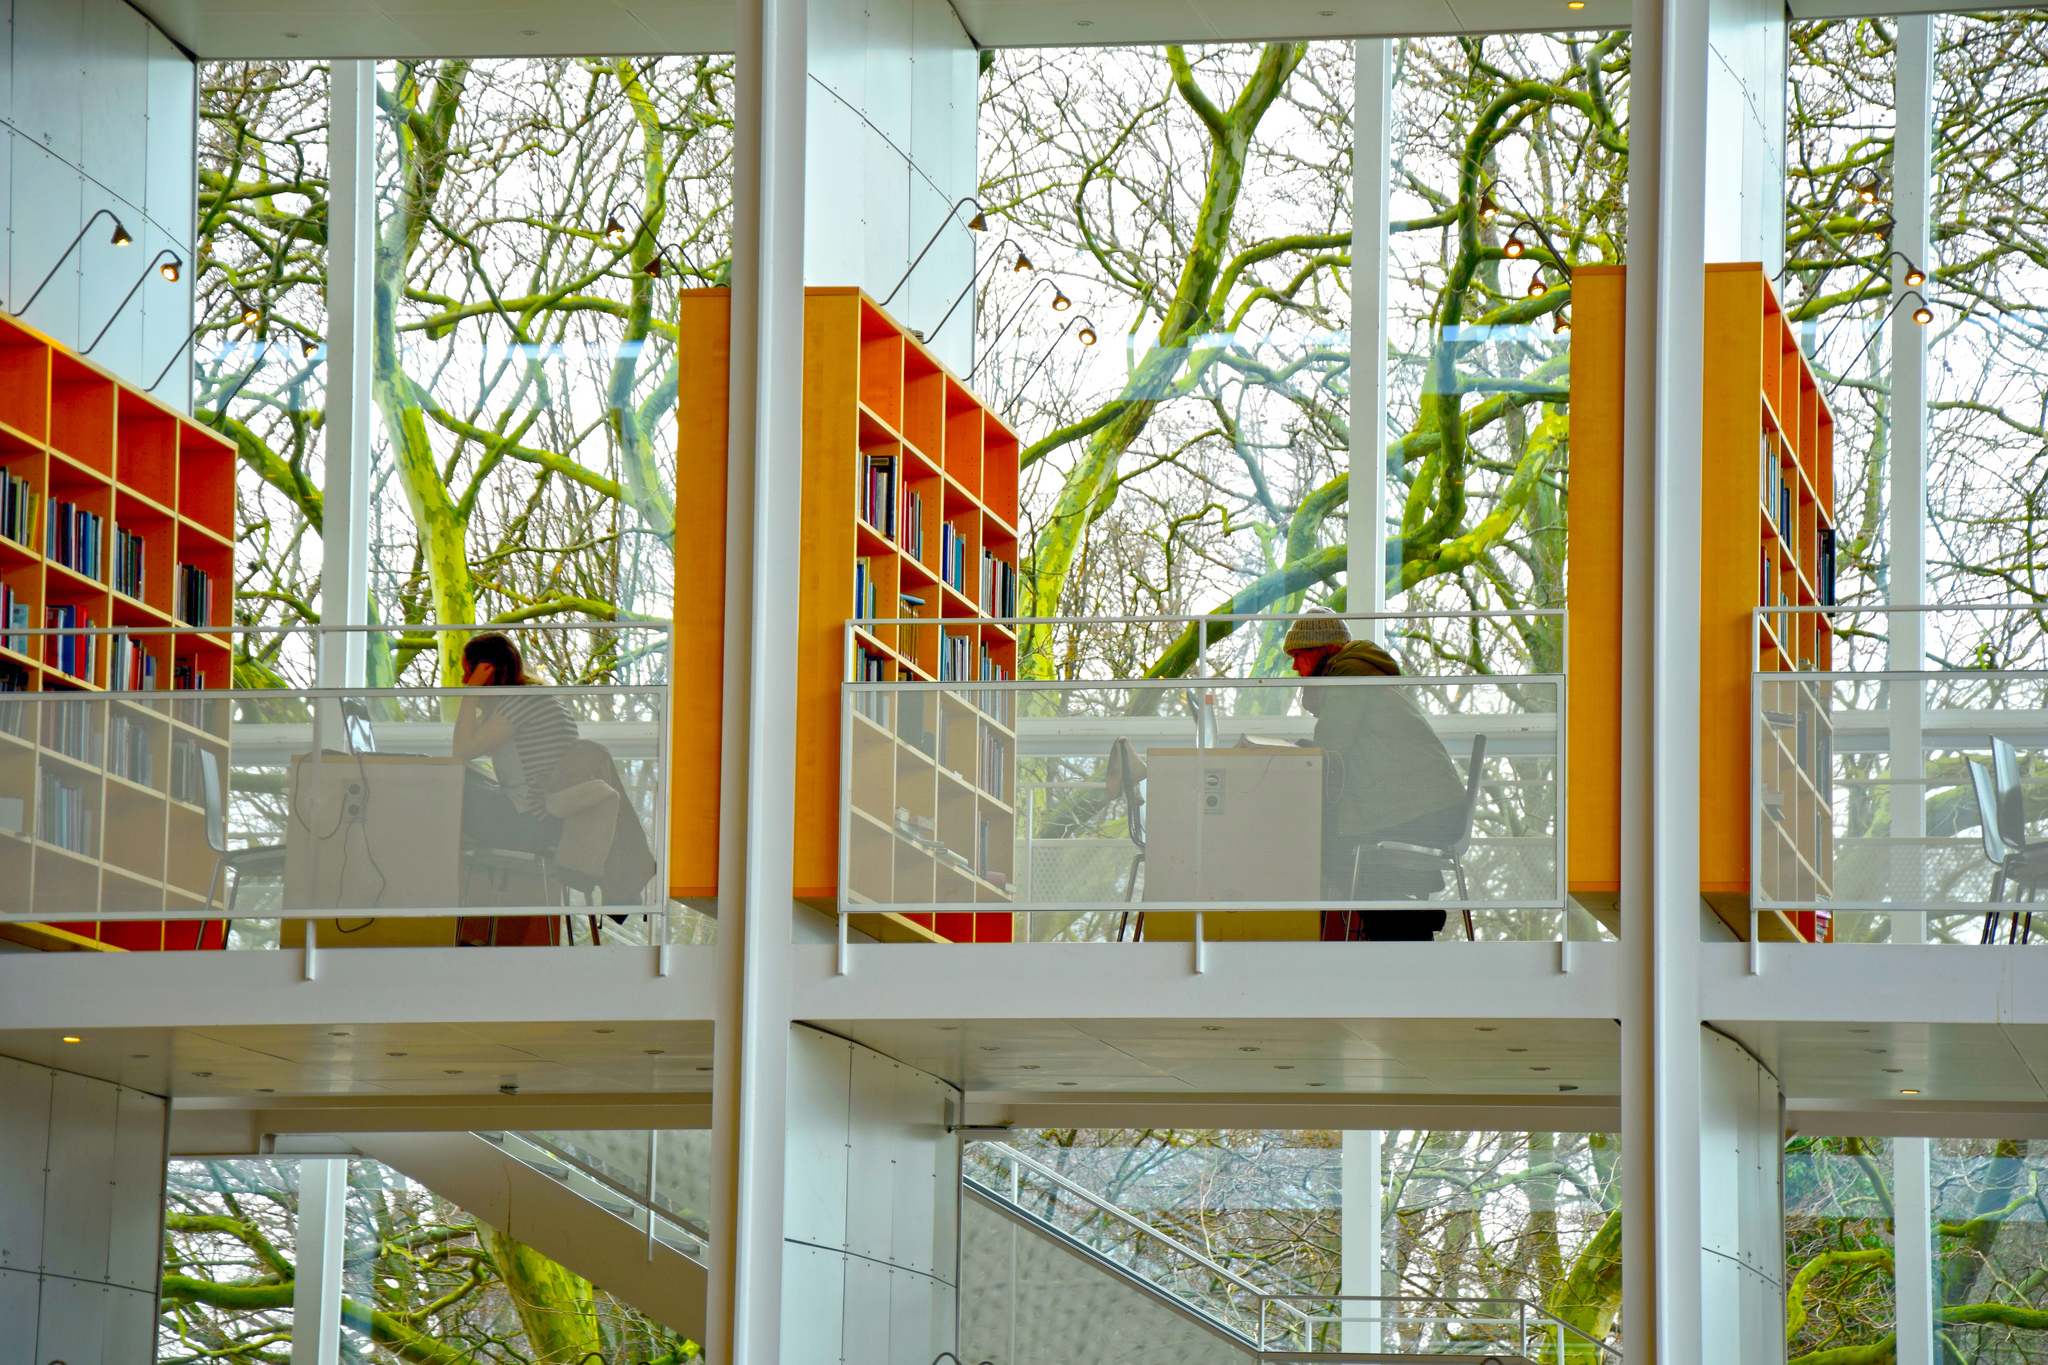 malm city library maria eklind flickr